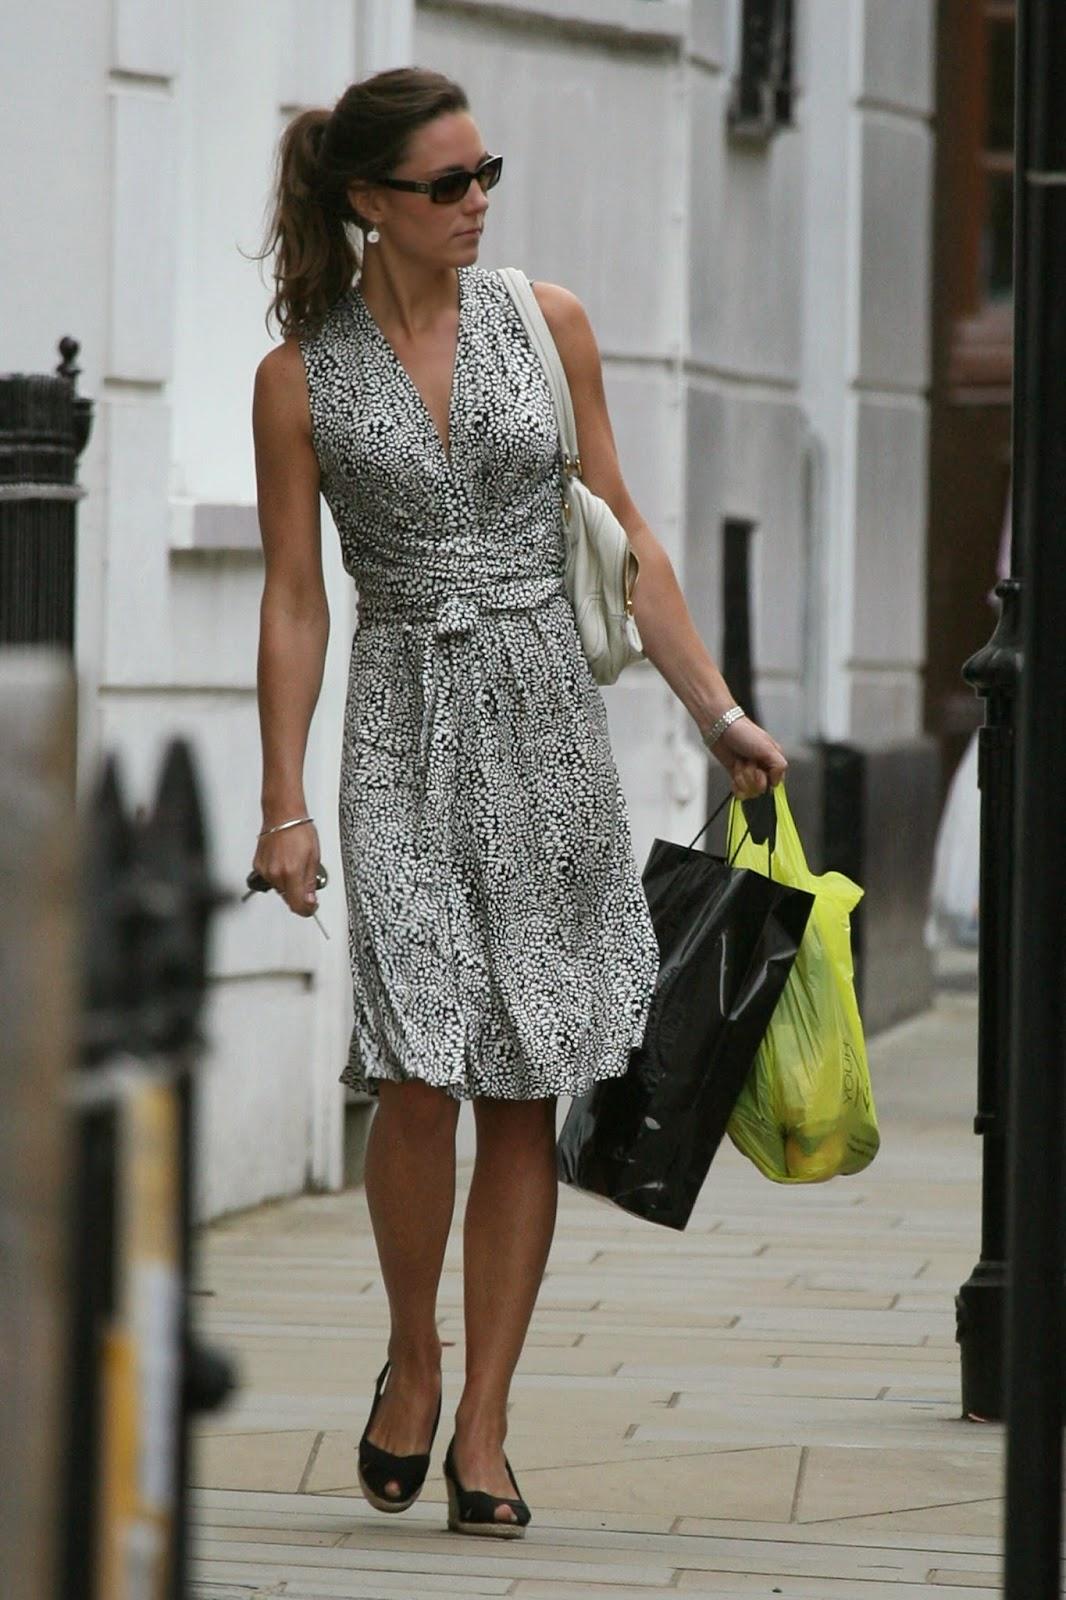 Kate Middleton Returns to her London Aprtment